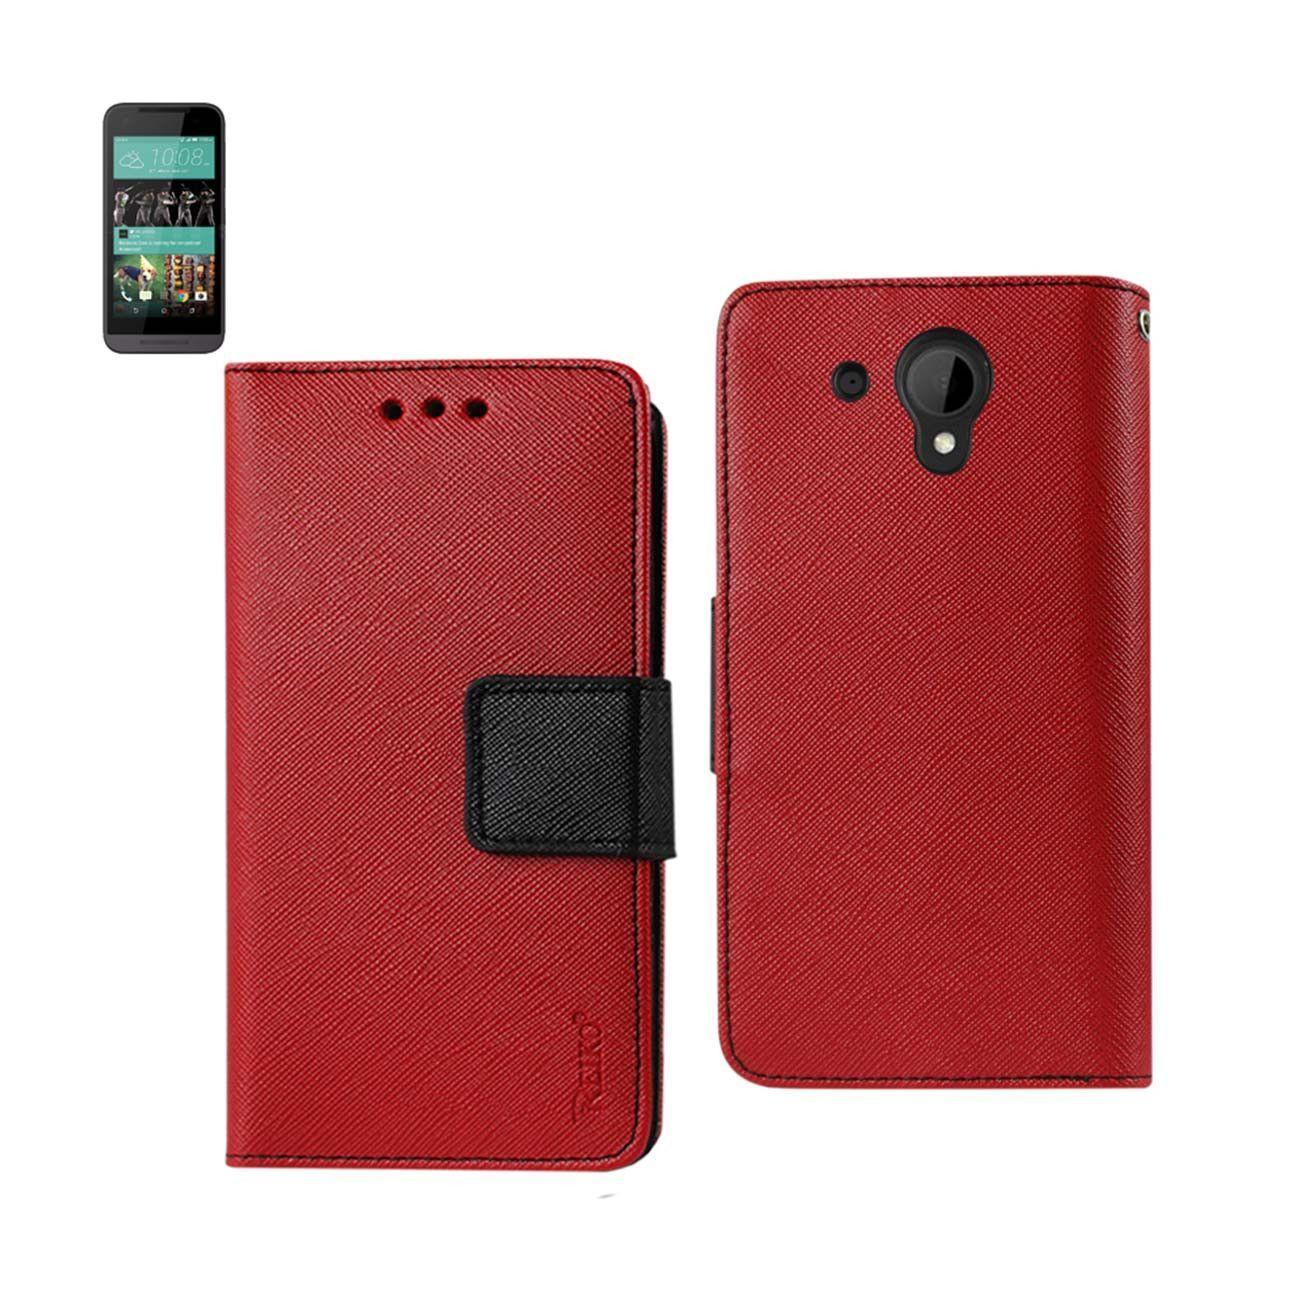 REIKO HTC DESIRE 520 3IN1 WALLET CASE IN RED Wallet